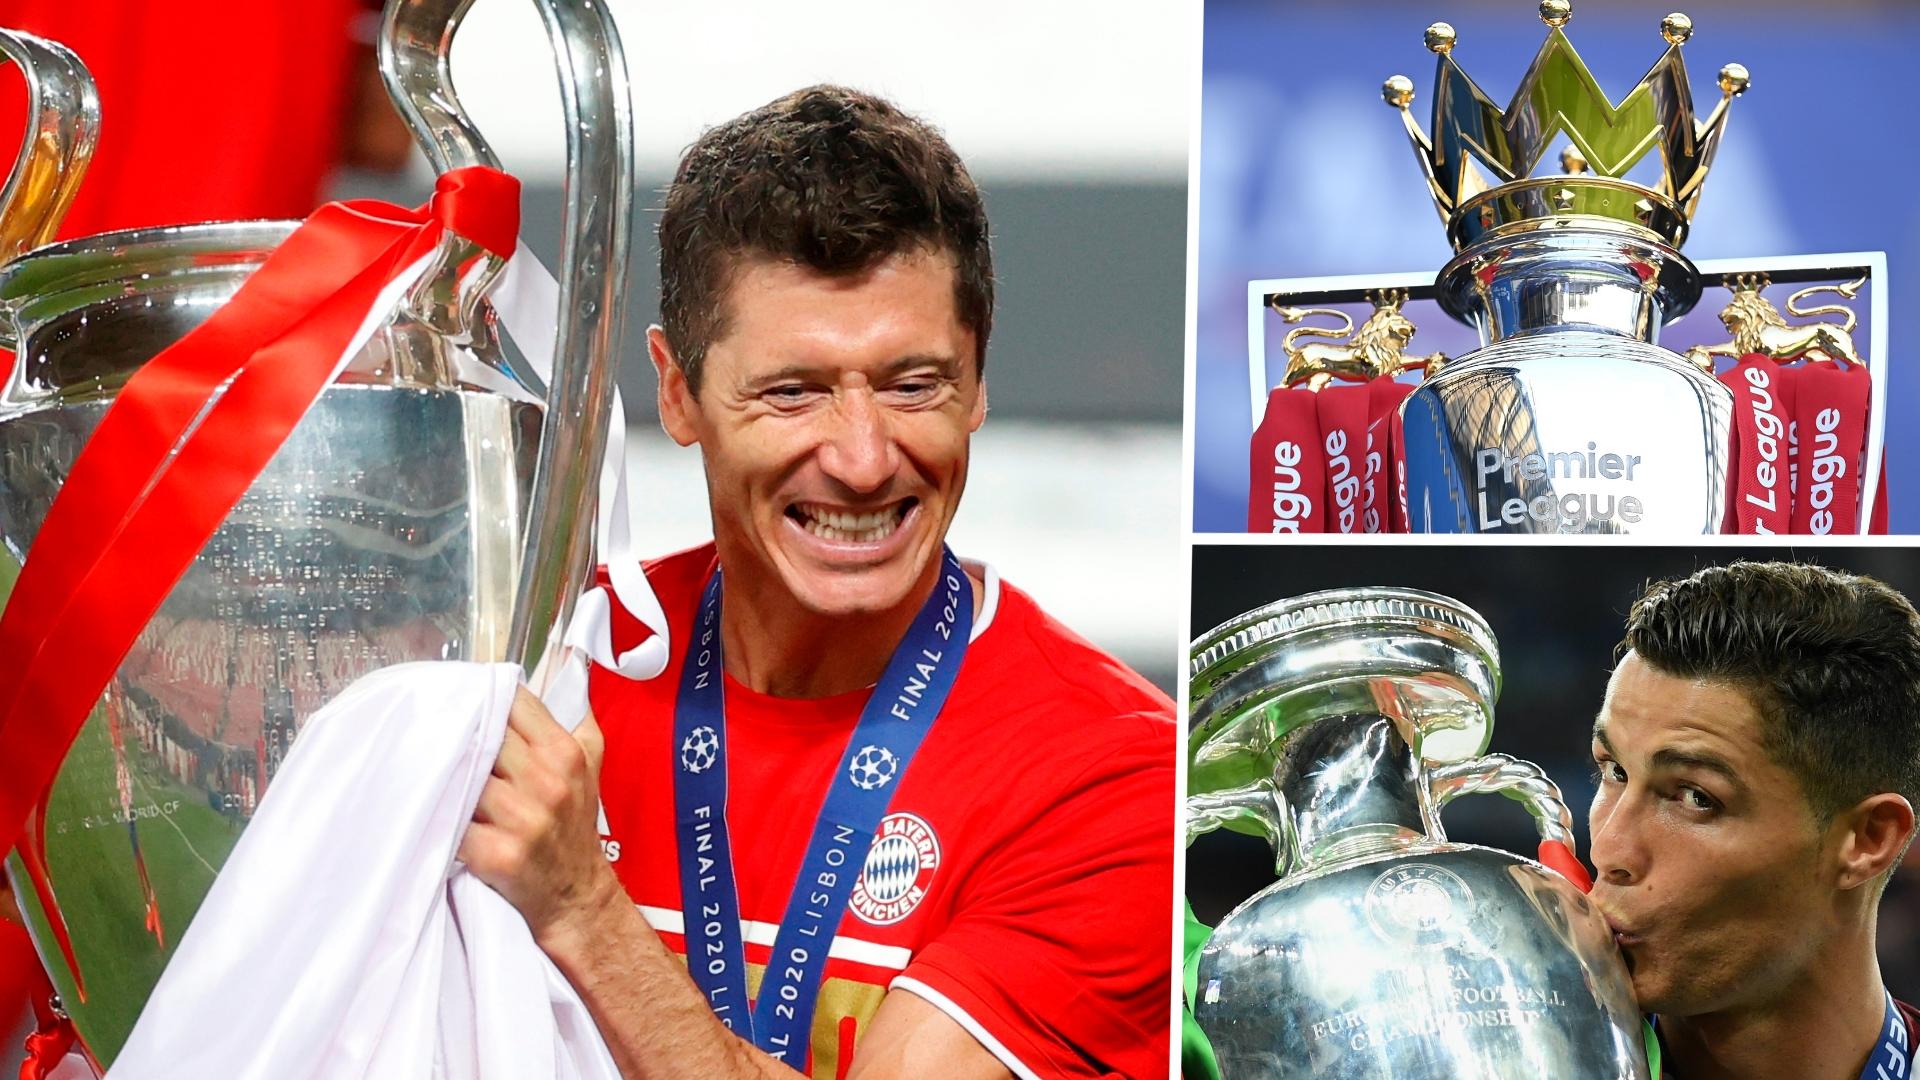 Calendrier Liga 2022 2023 Football calendar 2021: Key dates for Premier League, Champions